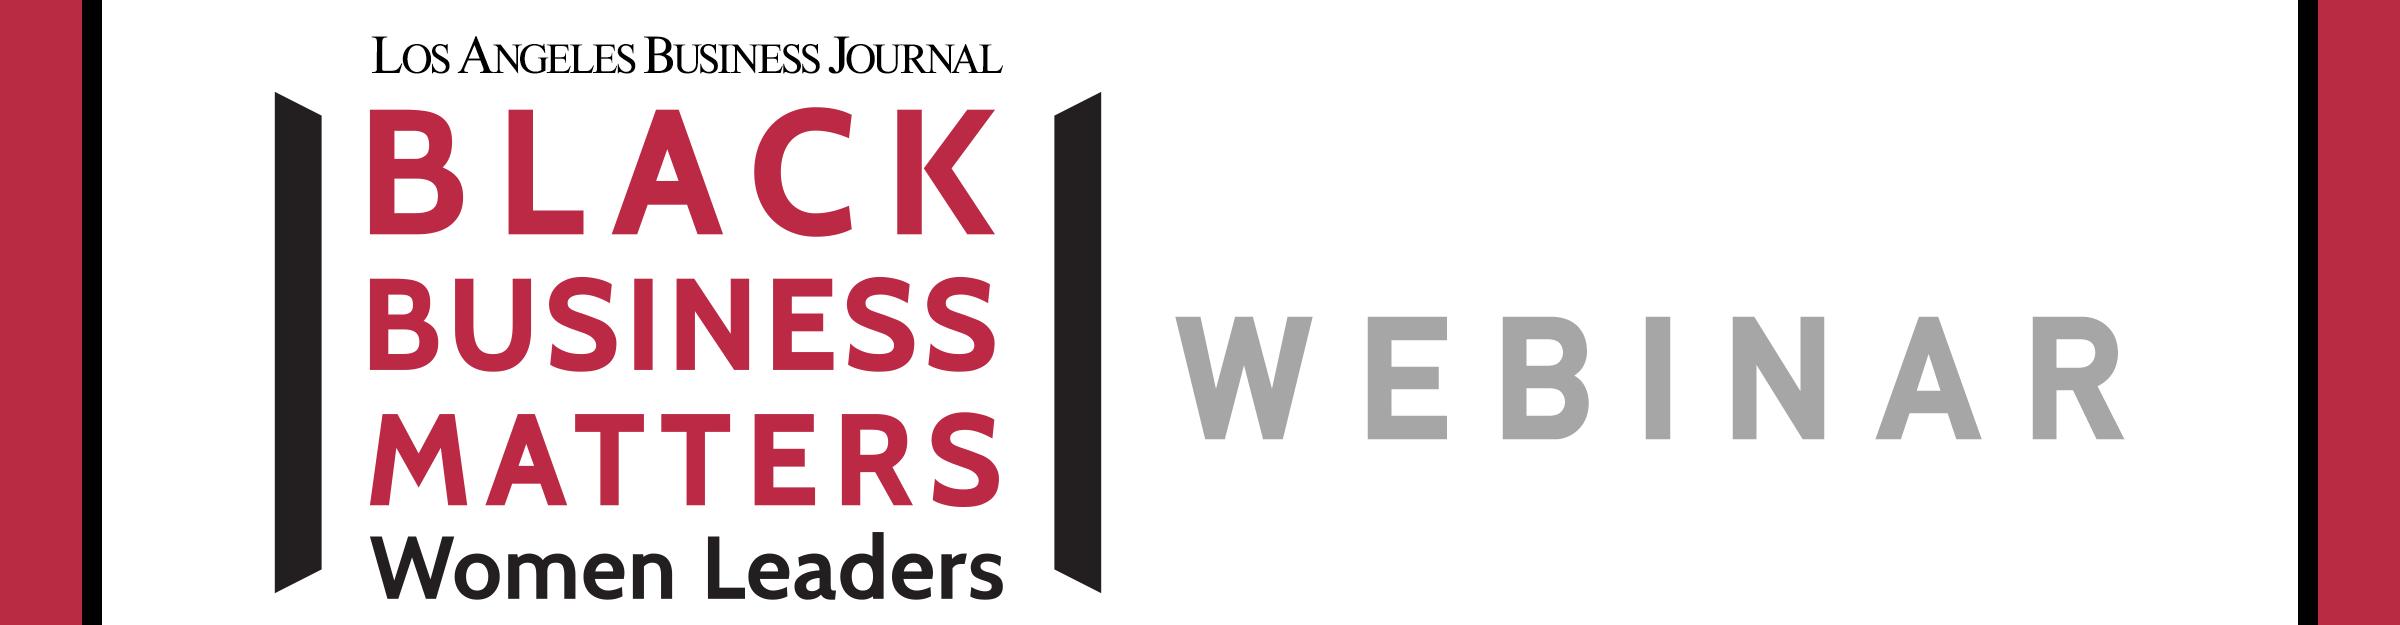 Los Angeles Business Journal Black Business Matters: Women Leaders